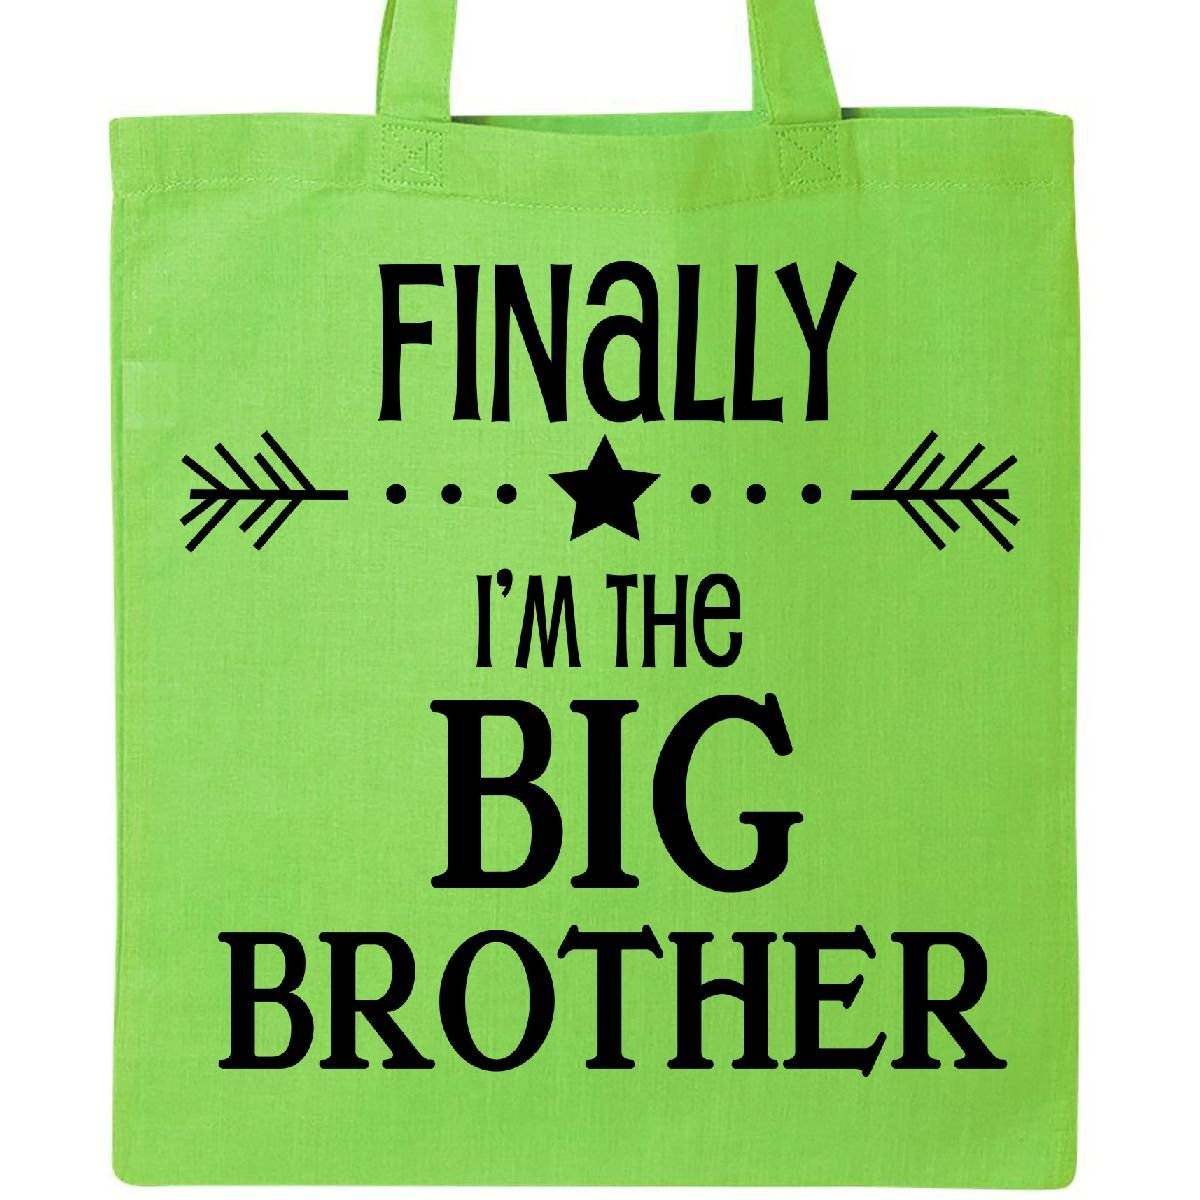 Inktastic – 最後にIm The Big Brotherトートバッグ One Size B077GK544S  ライムグリーン